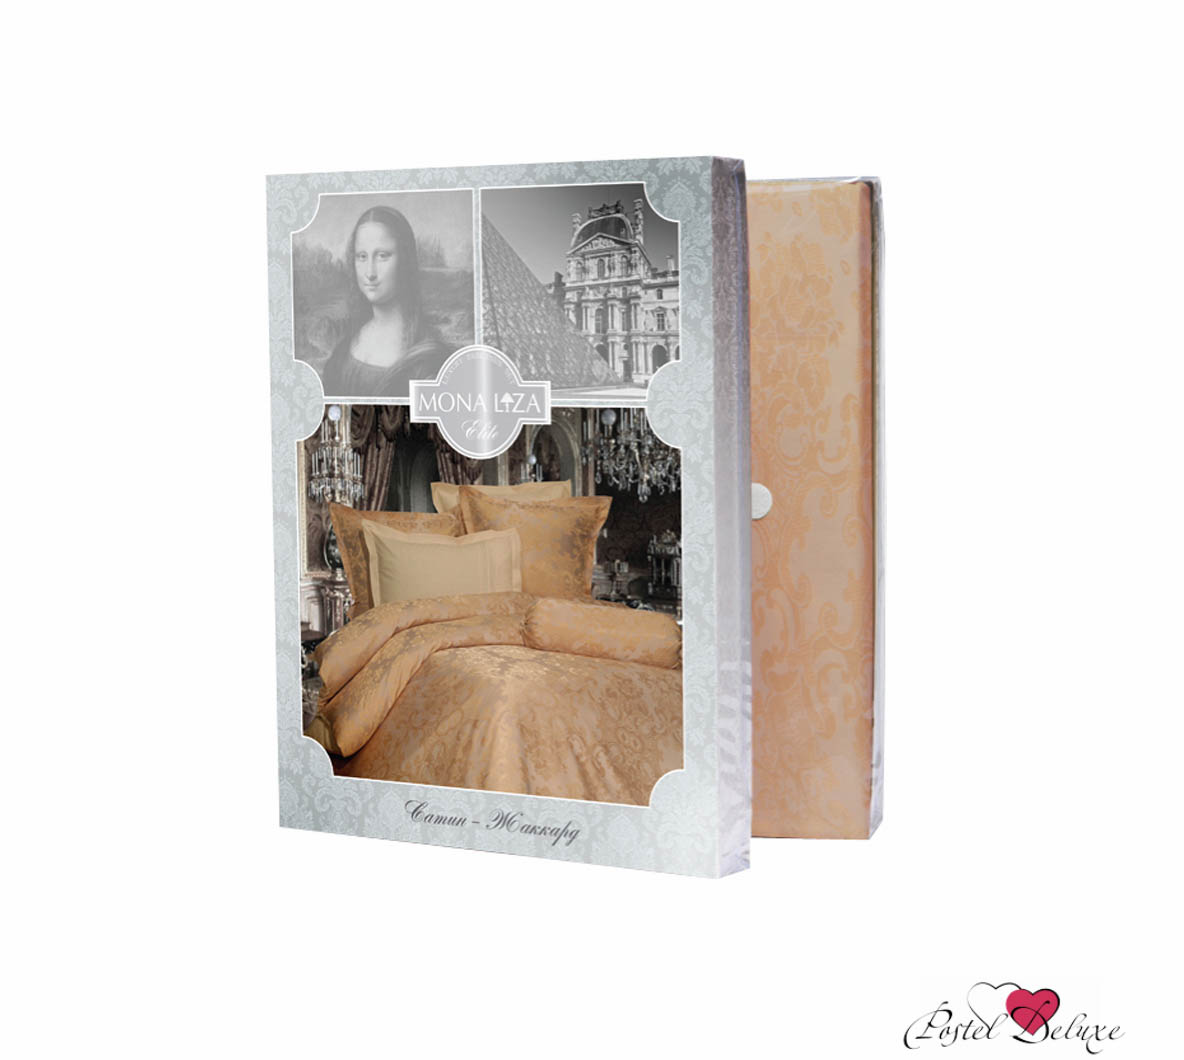 Постельное белье Mona Liza Постельное белье Madam Gisele (2 сп. евро) комплект пб 2 сп mona liza сатин жаккард royal 4 нав 2шт 70х70 и 2 шт